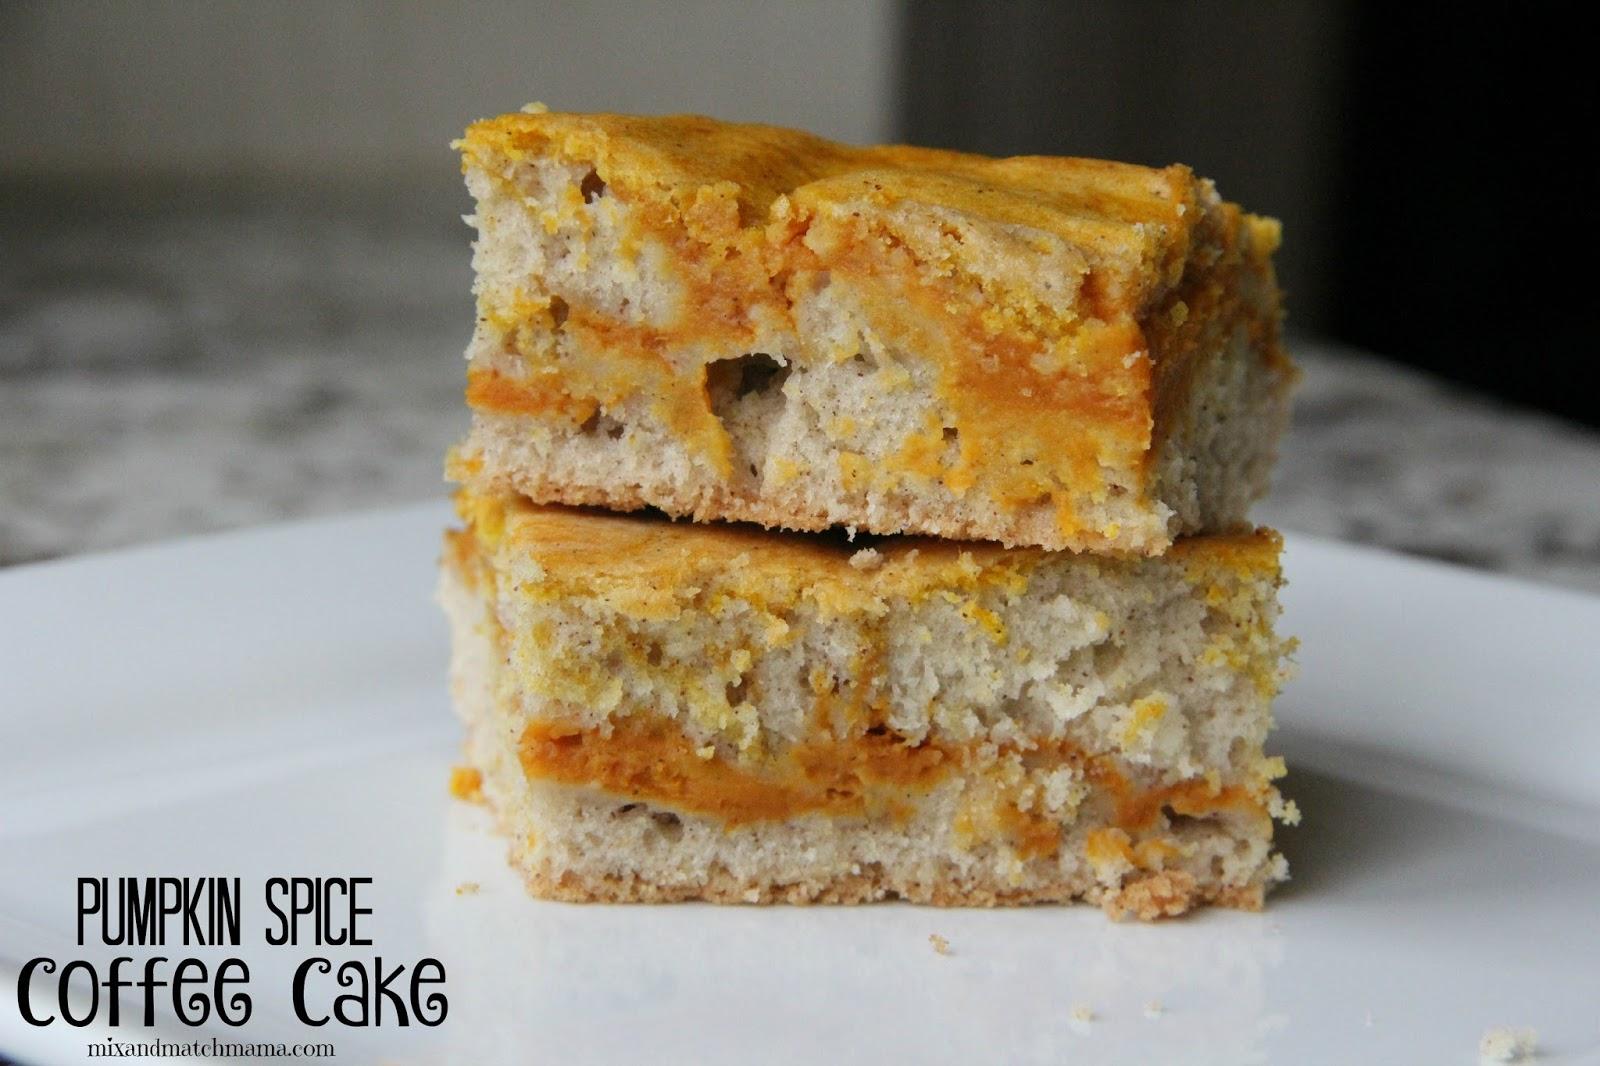 pumpkin spice coffee cake mix and match mama